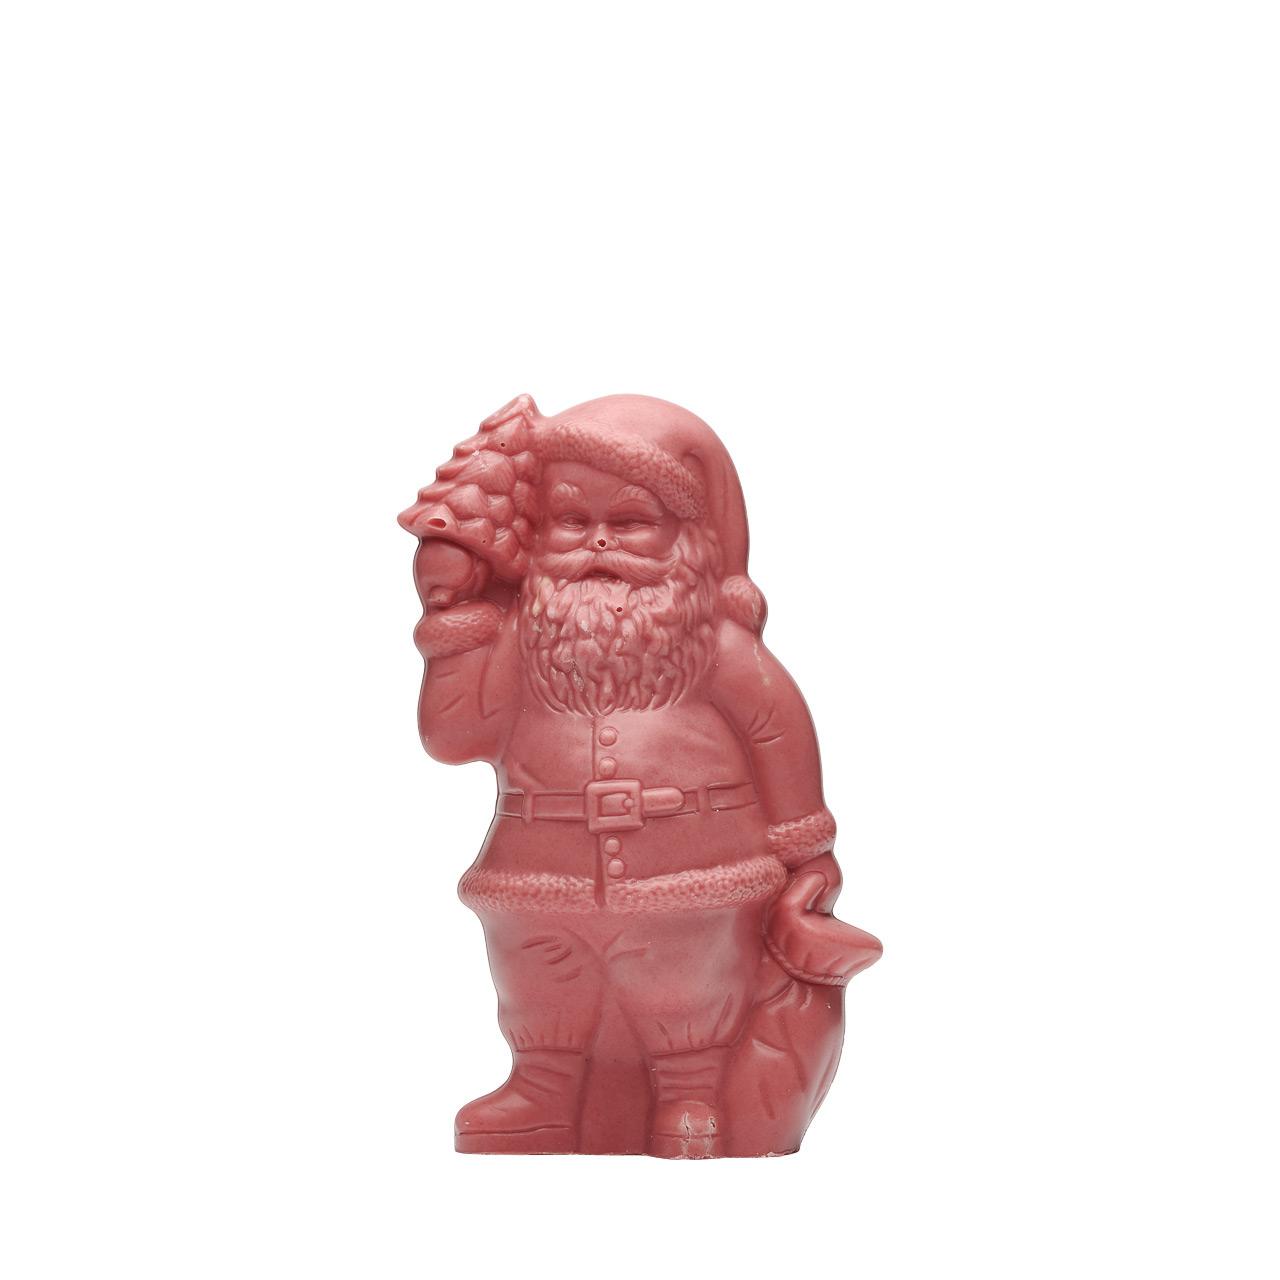 Kings Schokoladen-Weihnachtsmann Himbeere